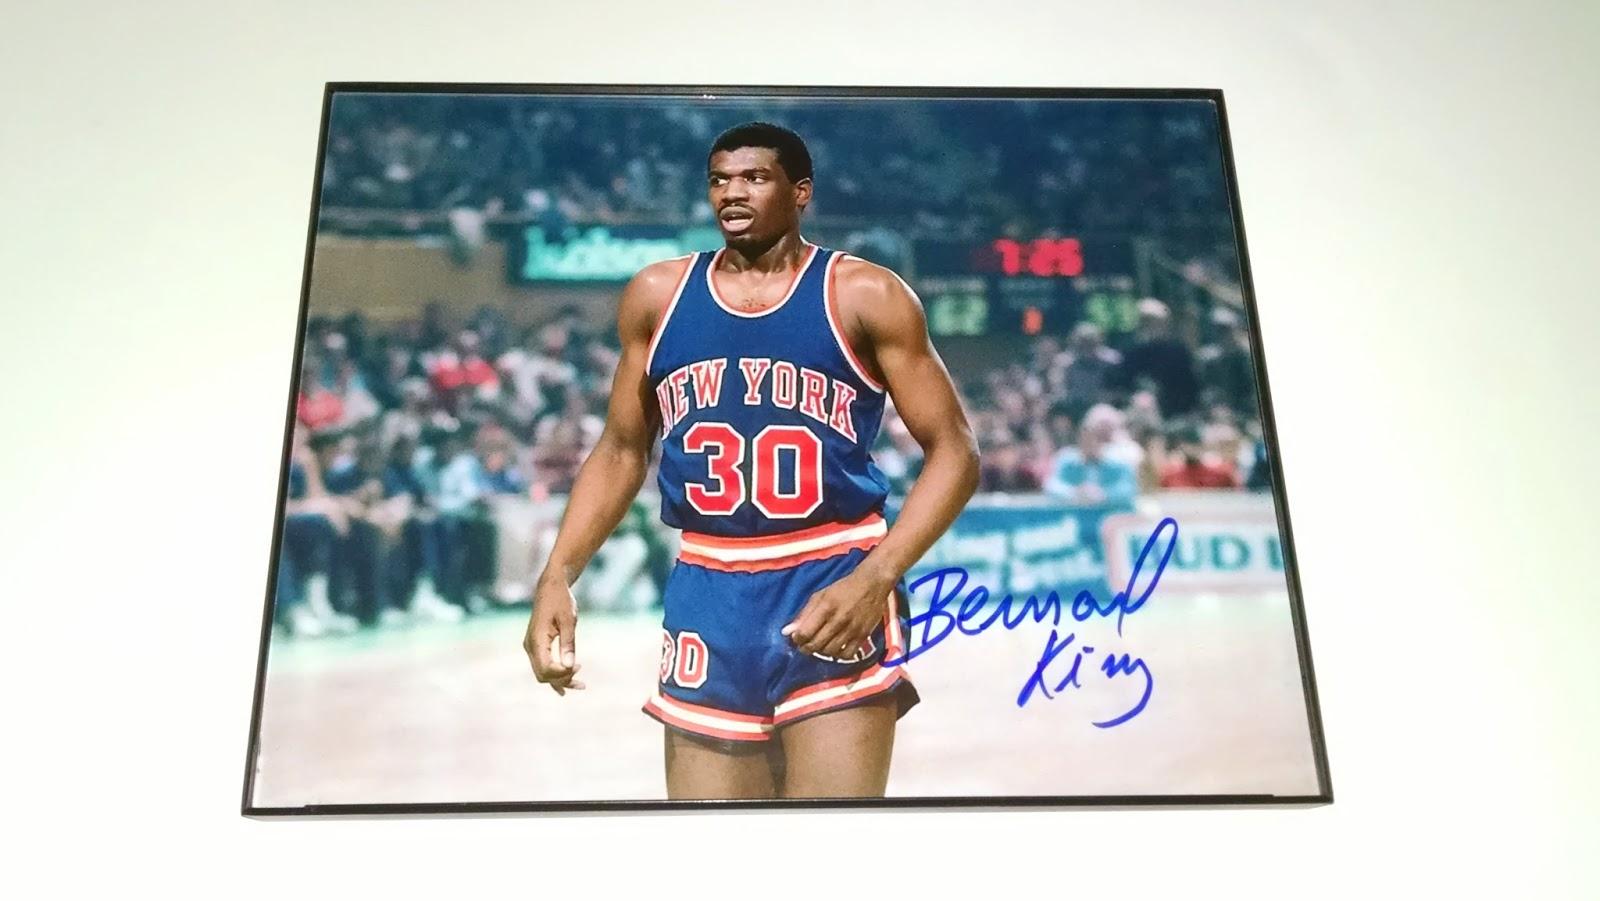 Jonathan s Autograph Signings Bernard King 03 22 14